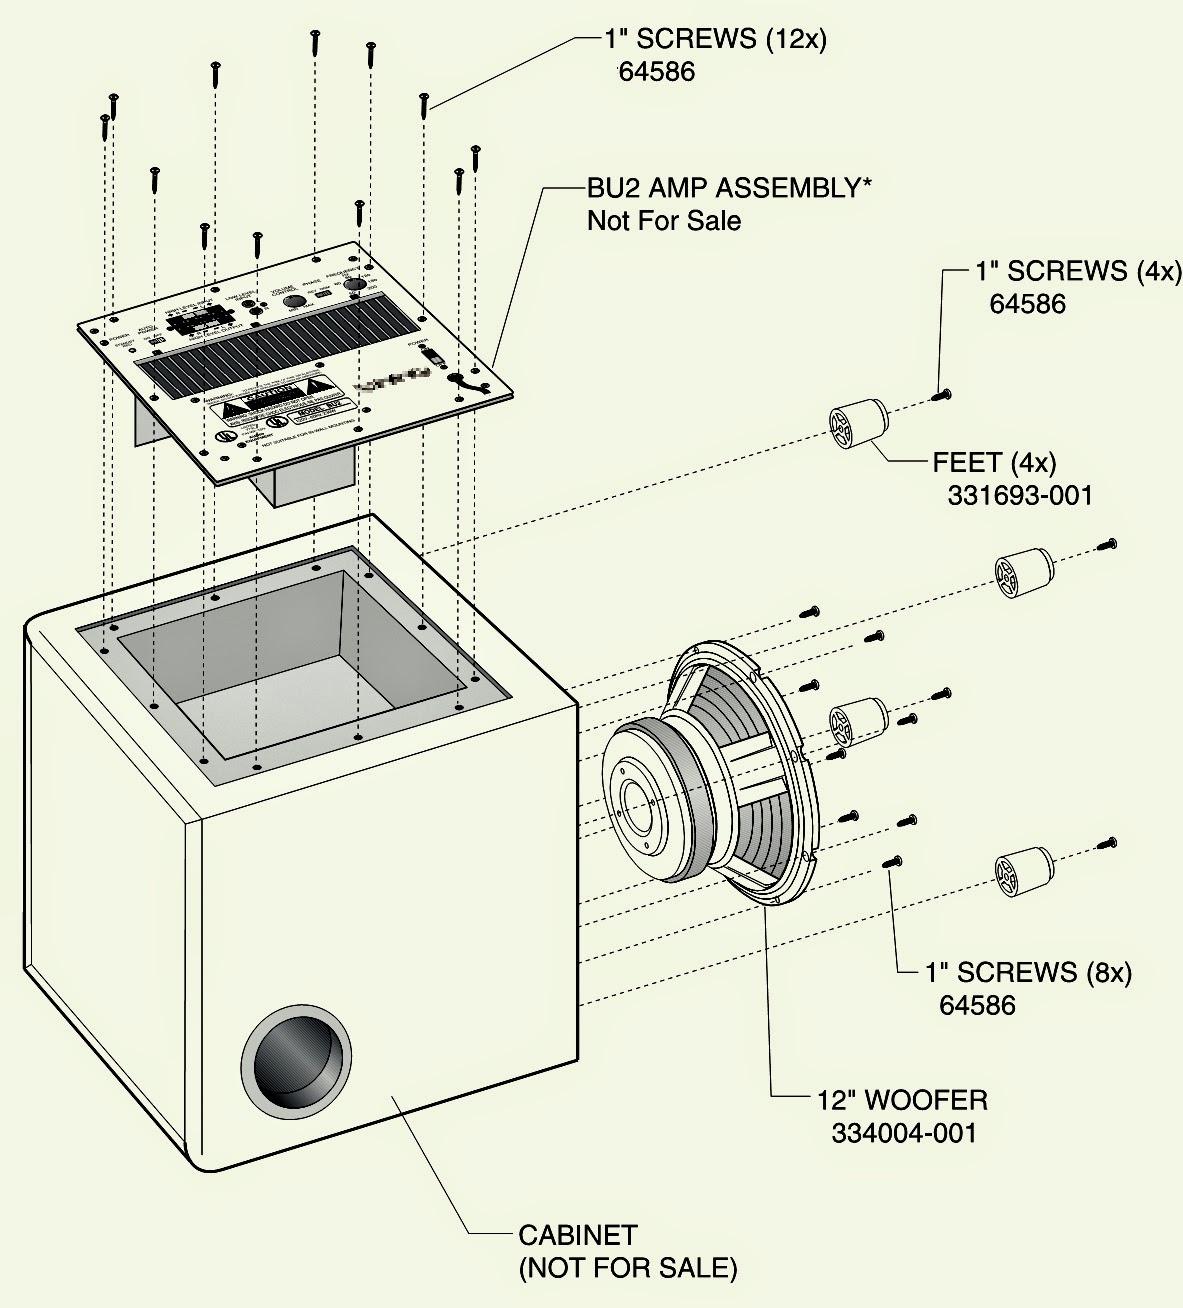 crossover networks woofer speaker diagram schematic circuit [ 1183 x 1308 Pixel ]